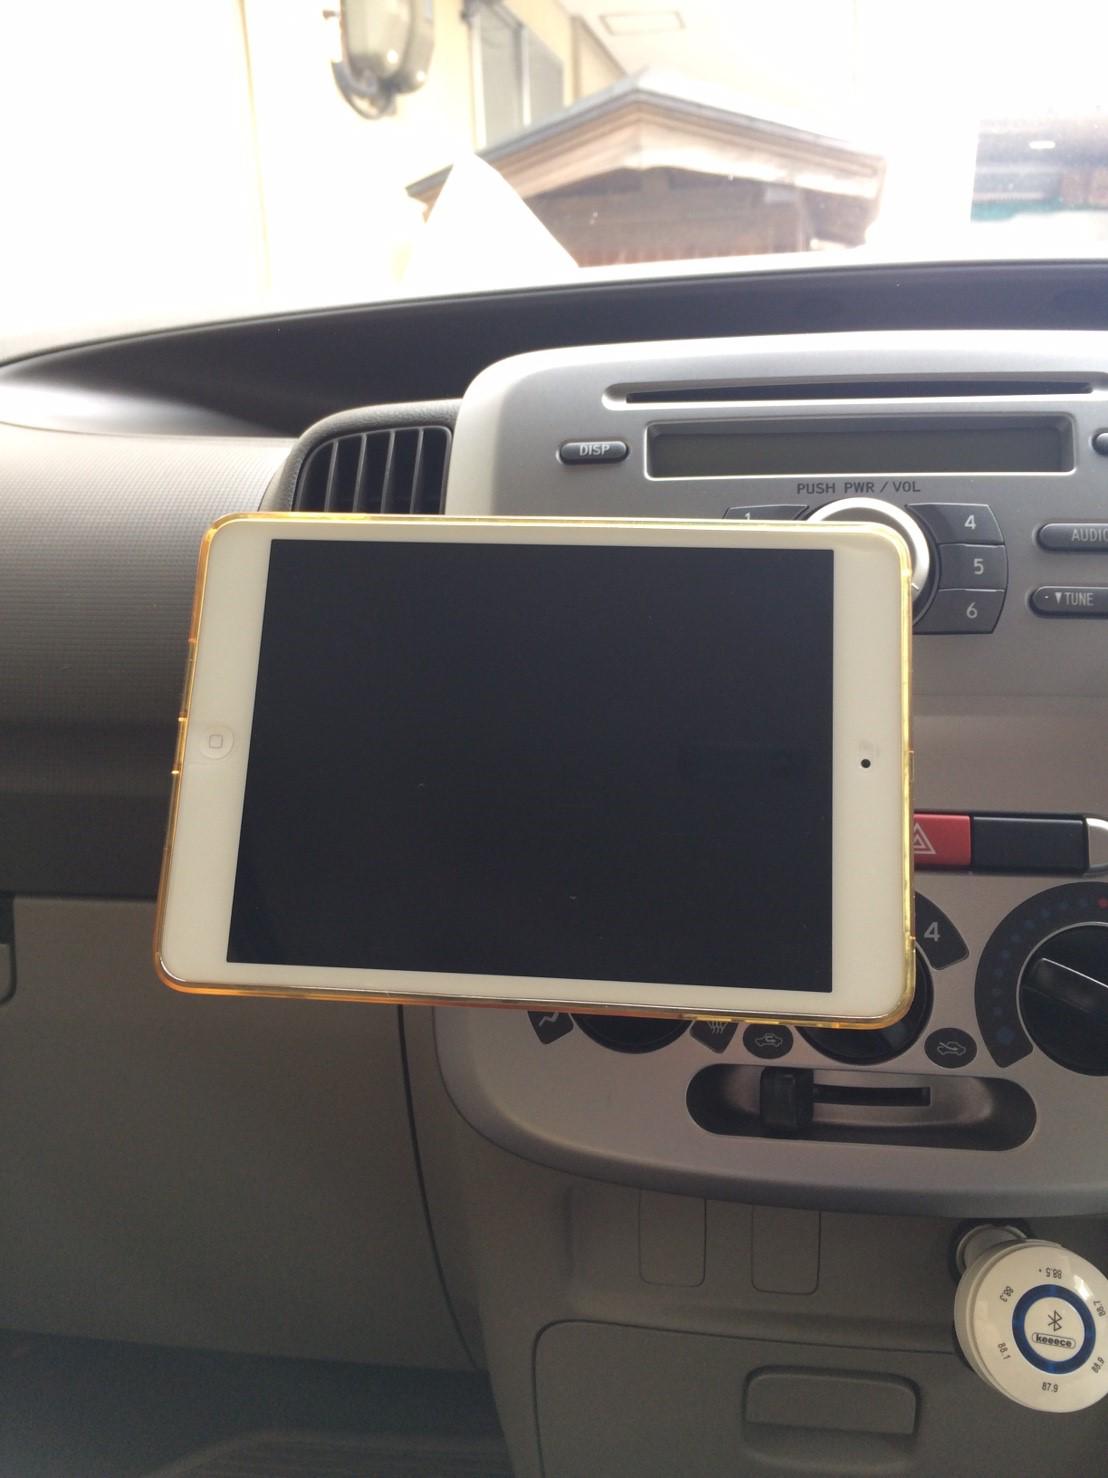 iPad miniをマグネットで取付